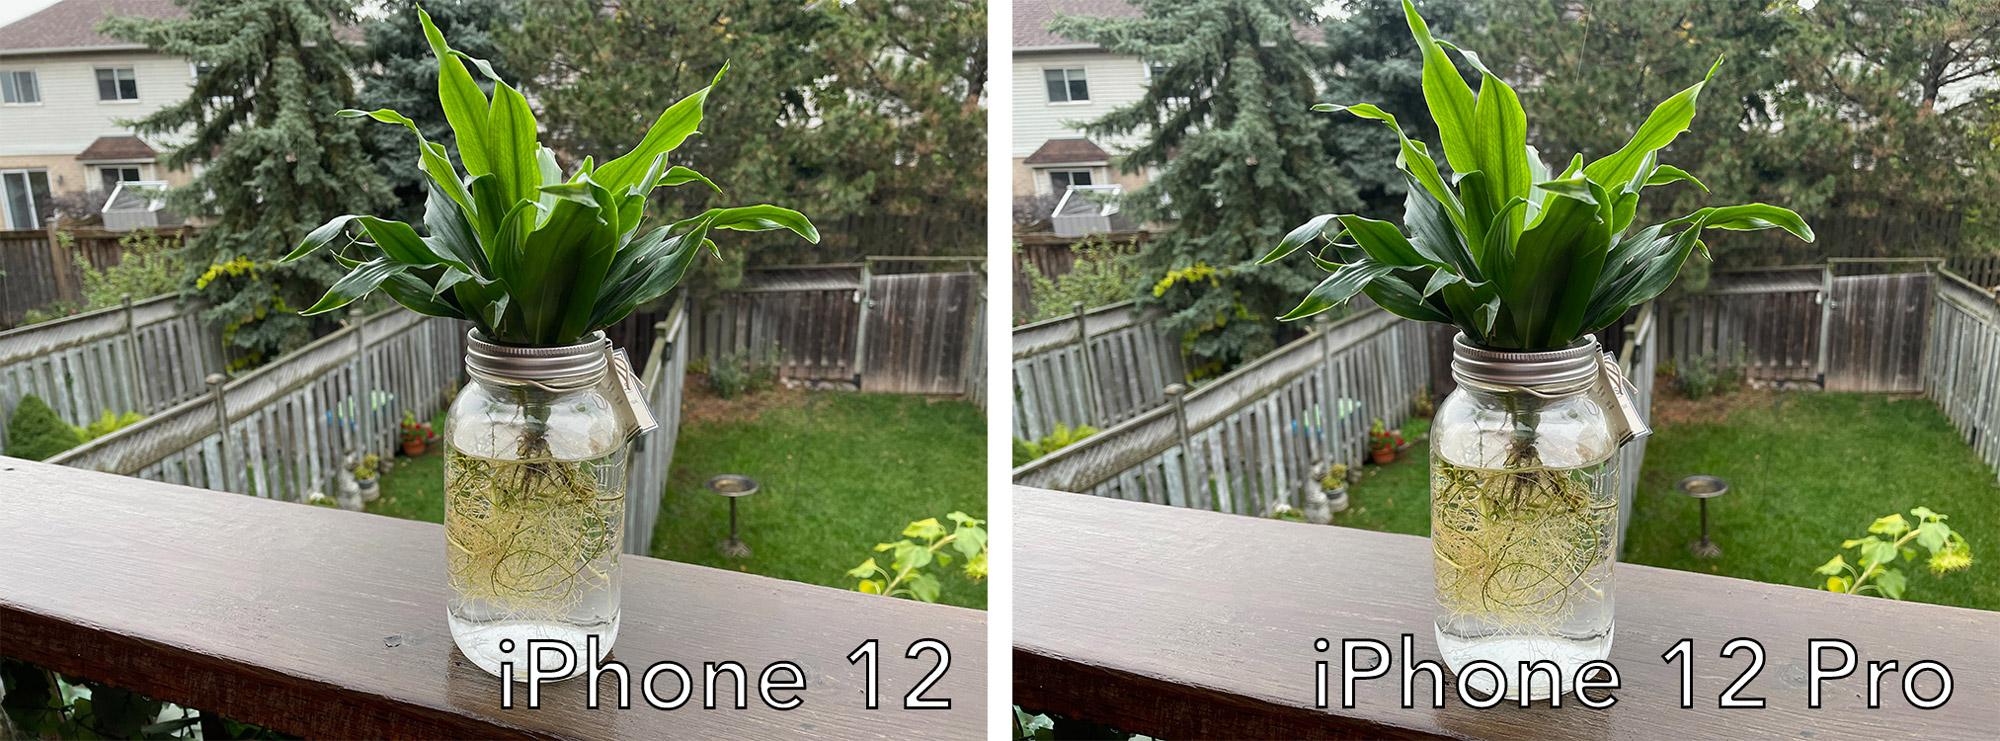 iPhone 12 photo compare